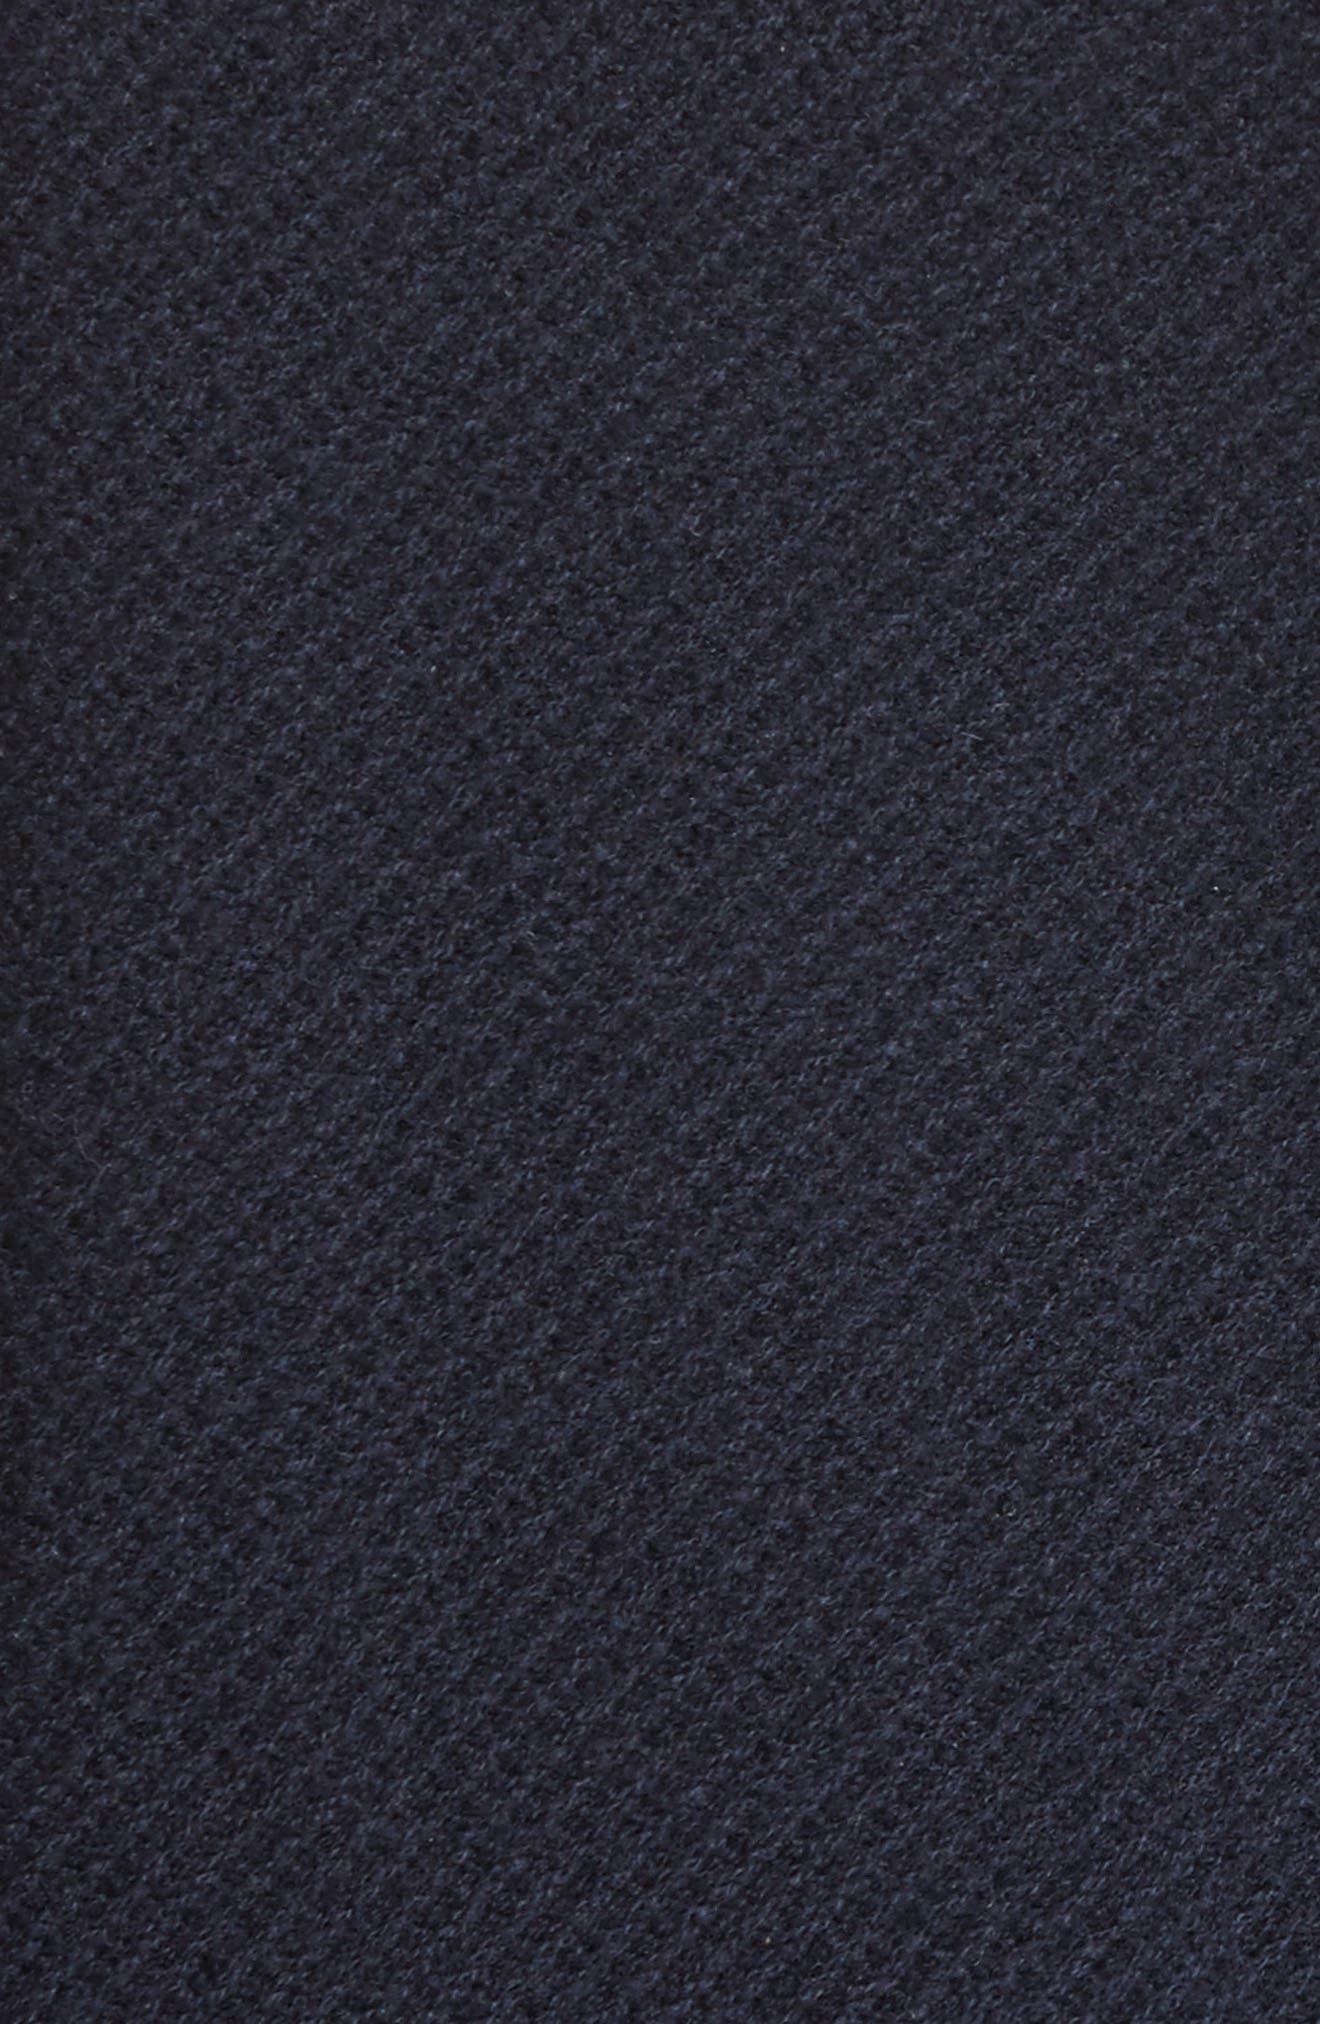 Windowpane Wool & Cashmere Sweater,                             Alternate thumbnail 5, color,                             400